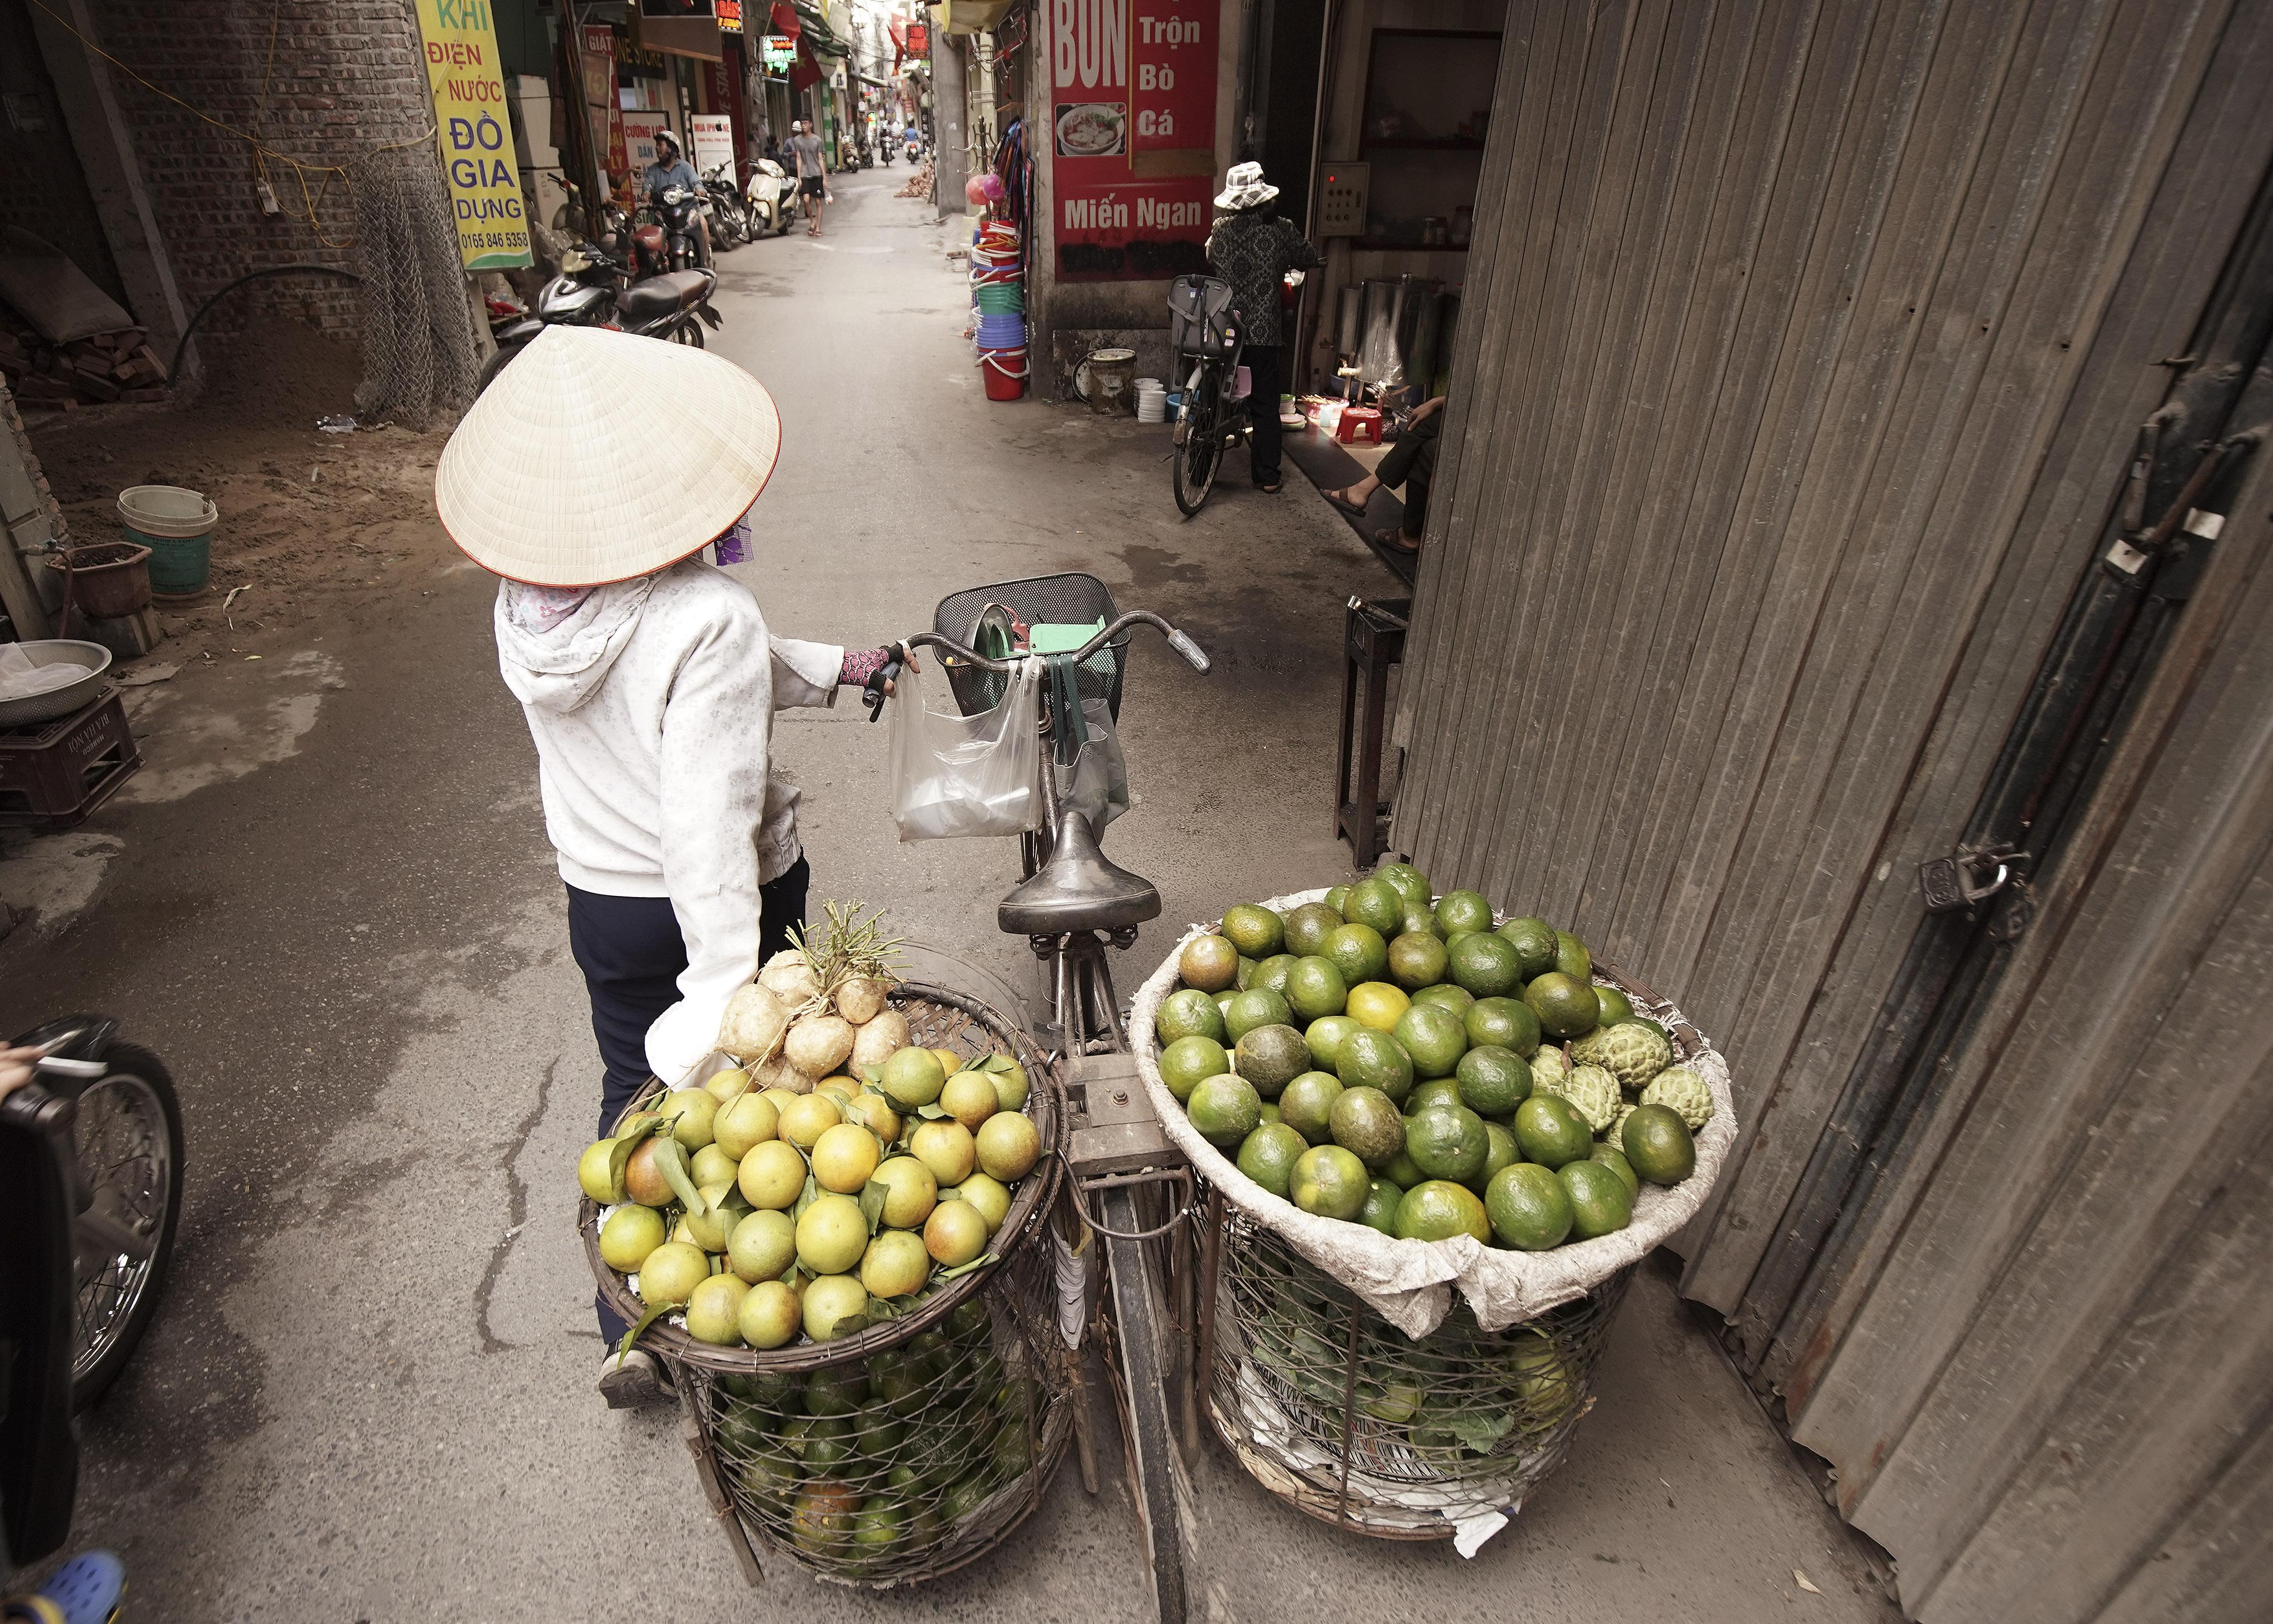 A woman sells produce in Hanoi, Vietnam, on Sunday, Nov. 17, 2019.